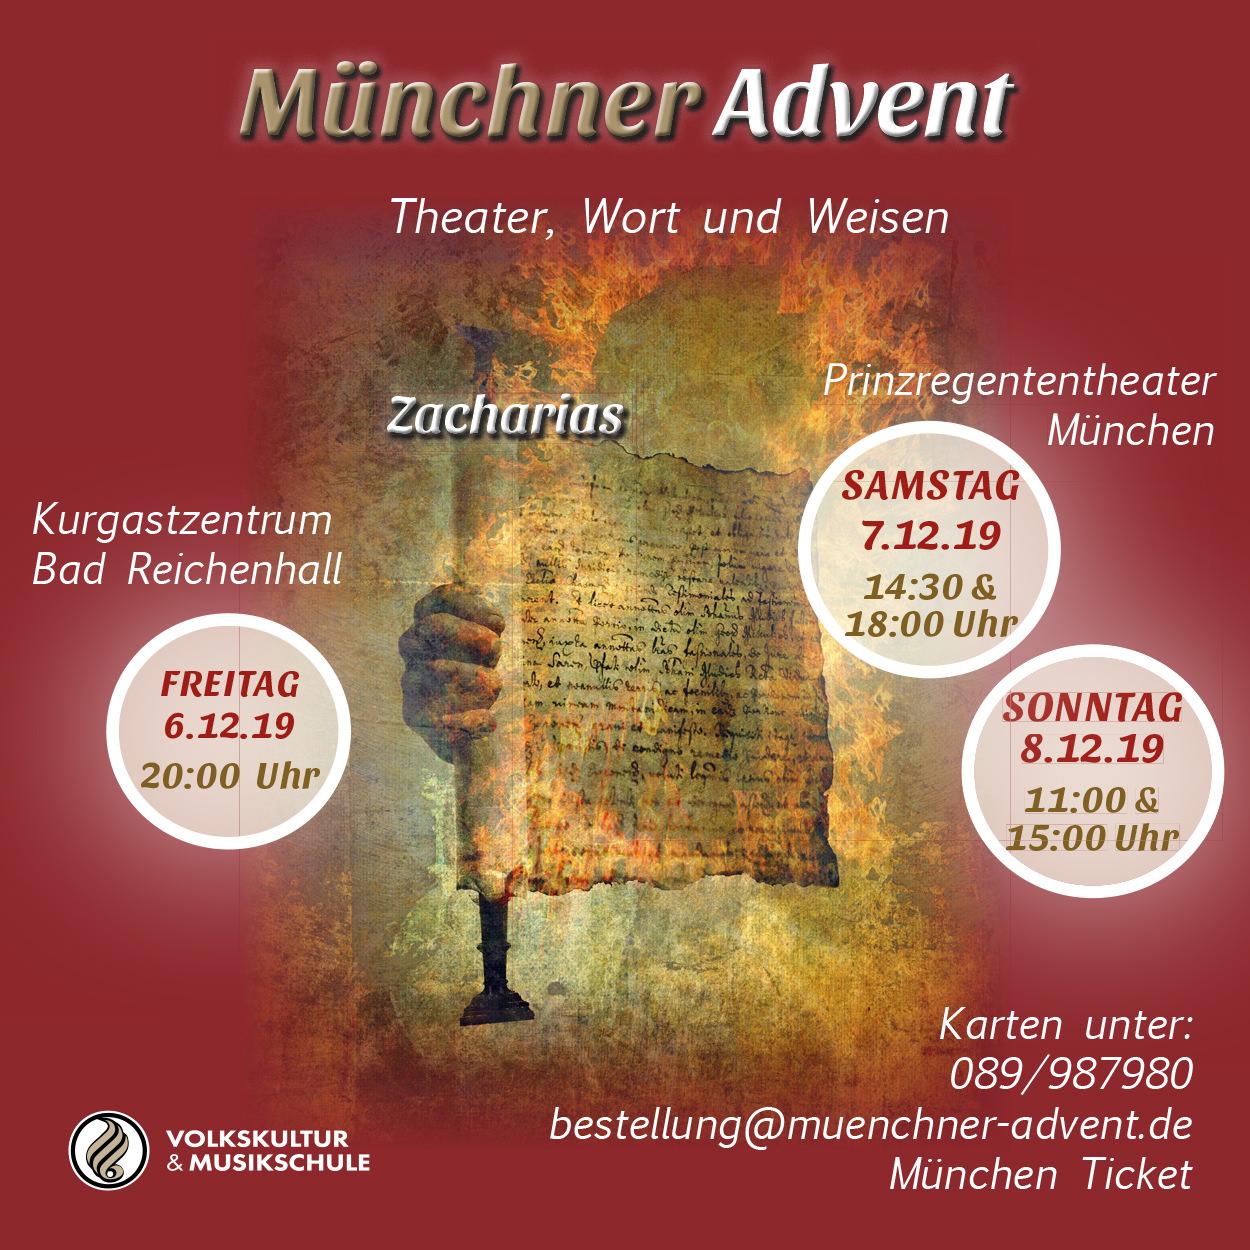 Wastl Fanderl Schule Münchner Advent